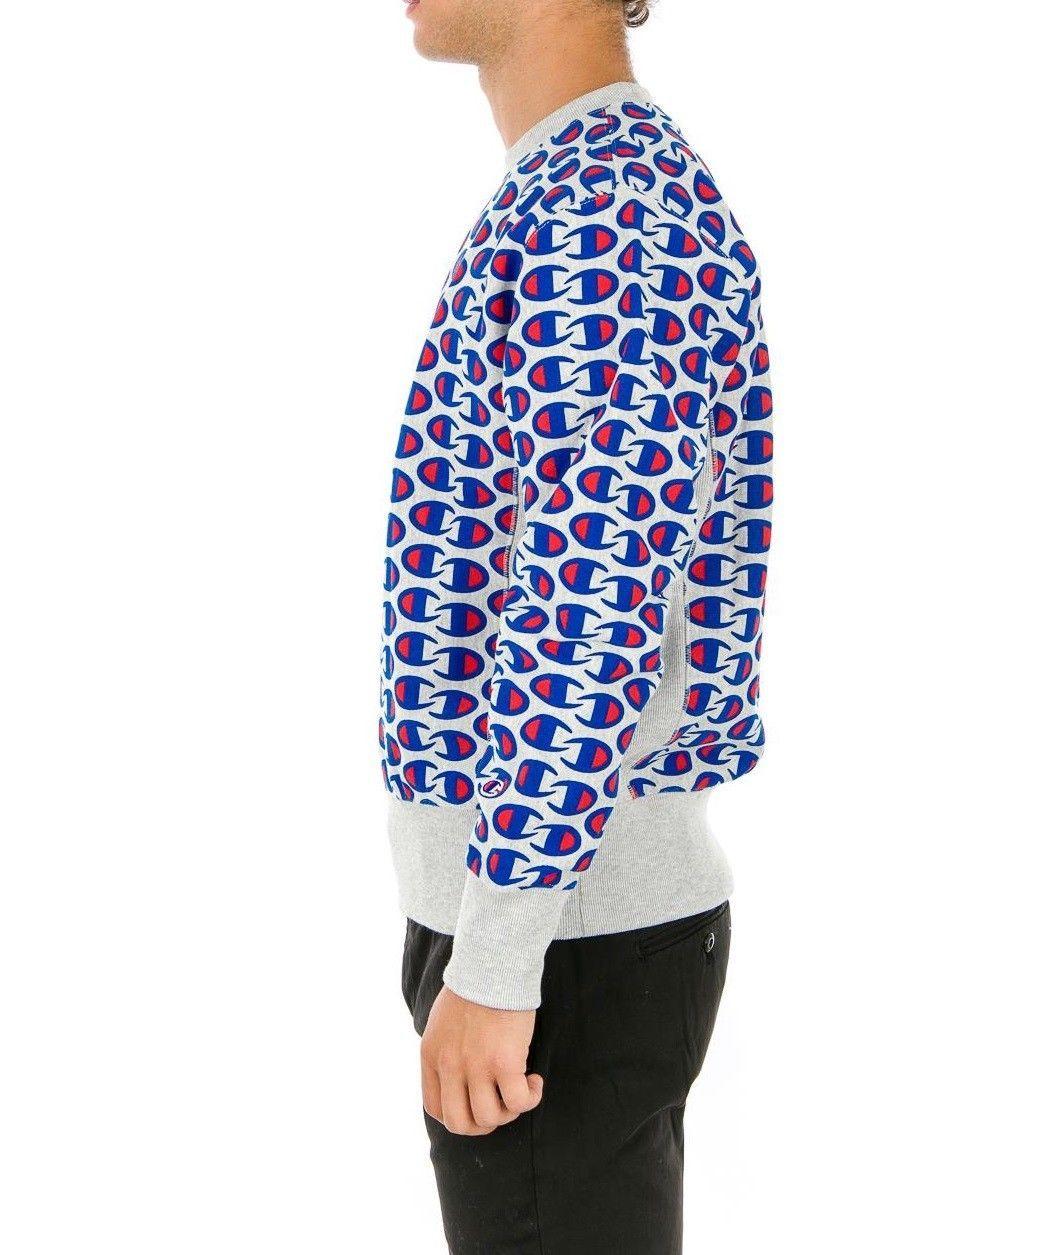 Sale Sweatshirt Champion 212429 Reverse Weave Man Round Neck Grey Blue Fleece Wi image 2